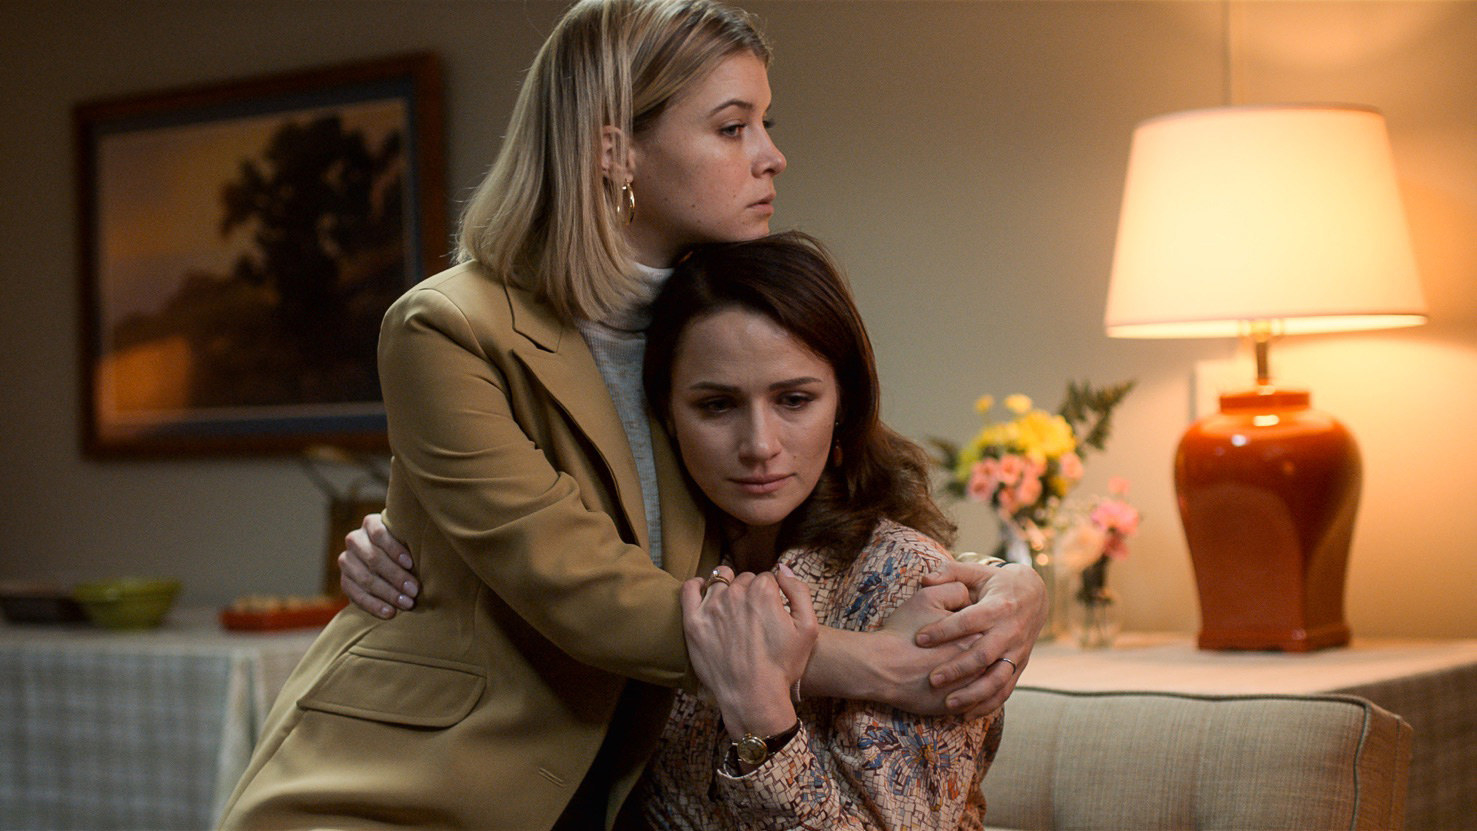 Shantel embracing someone